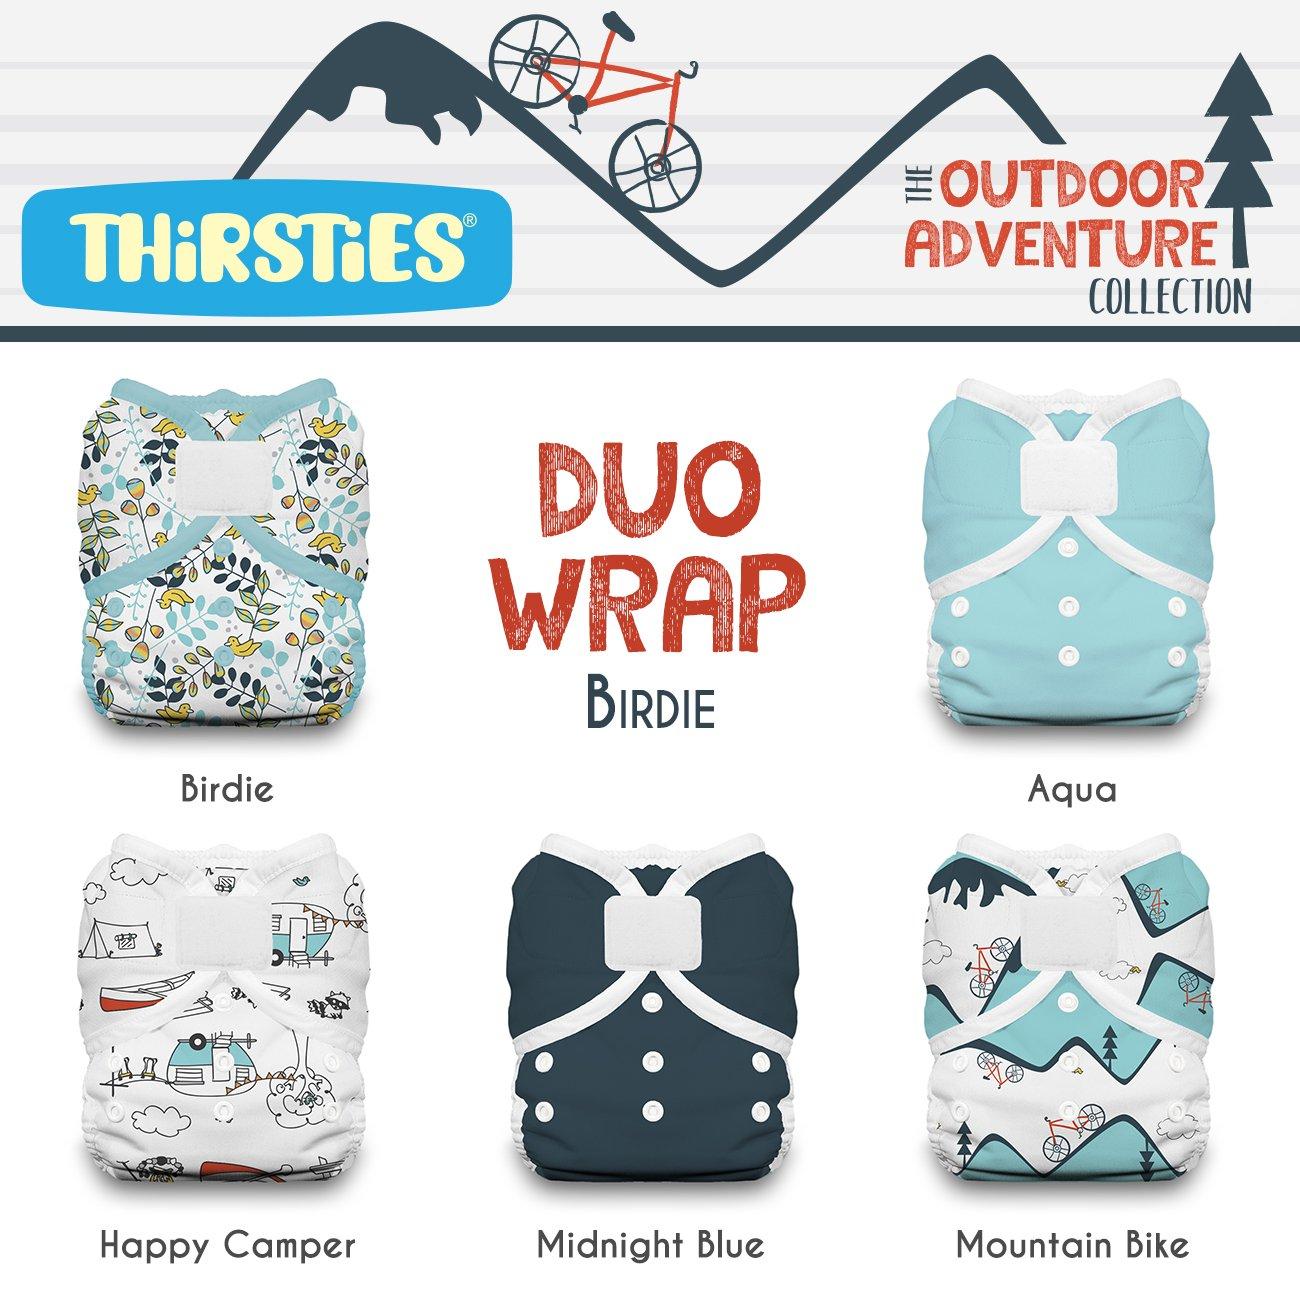 Thirsties Package, Duo Wrap Hook & Loop, Outdoor Adventure Collection Birdie Size 1